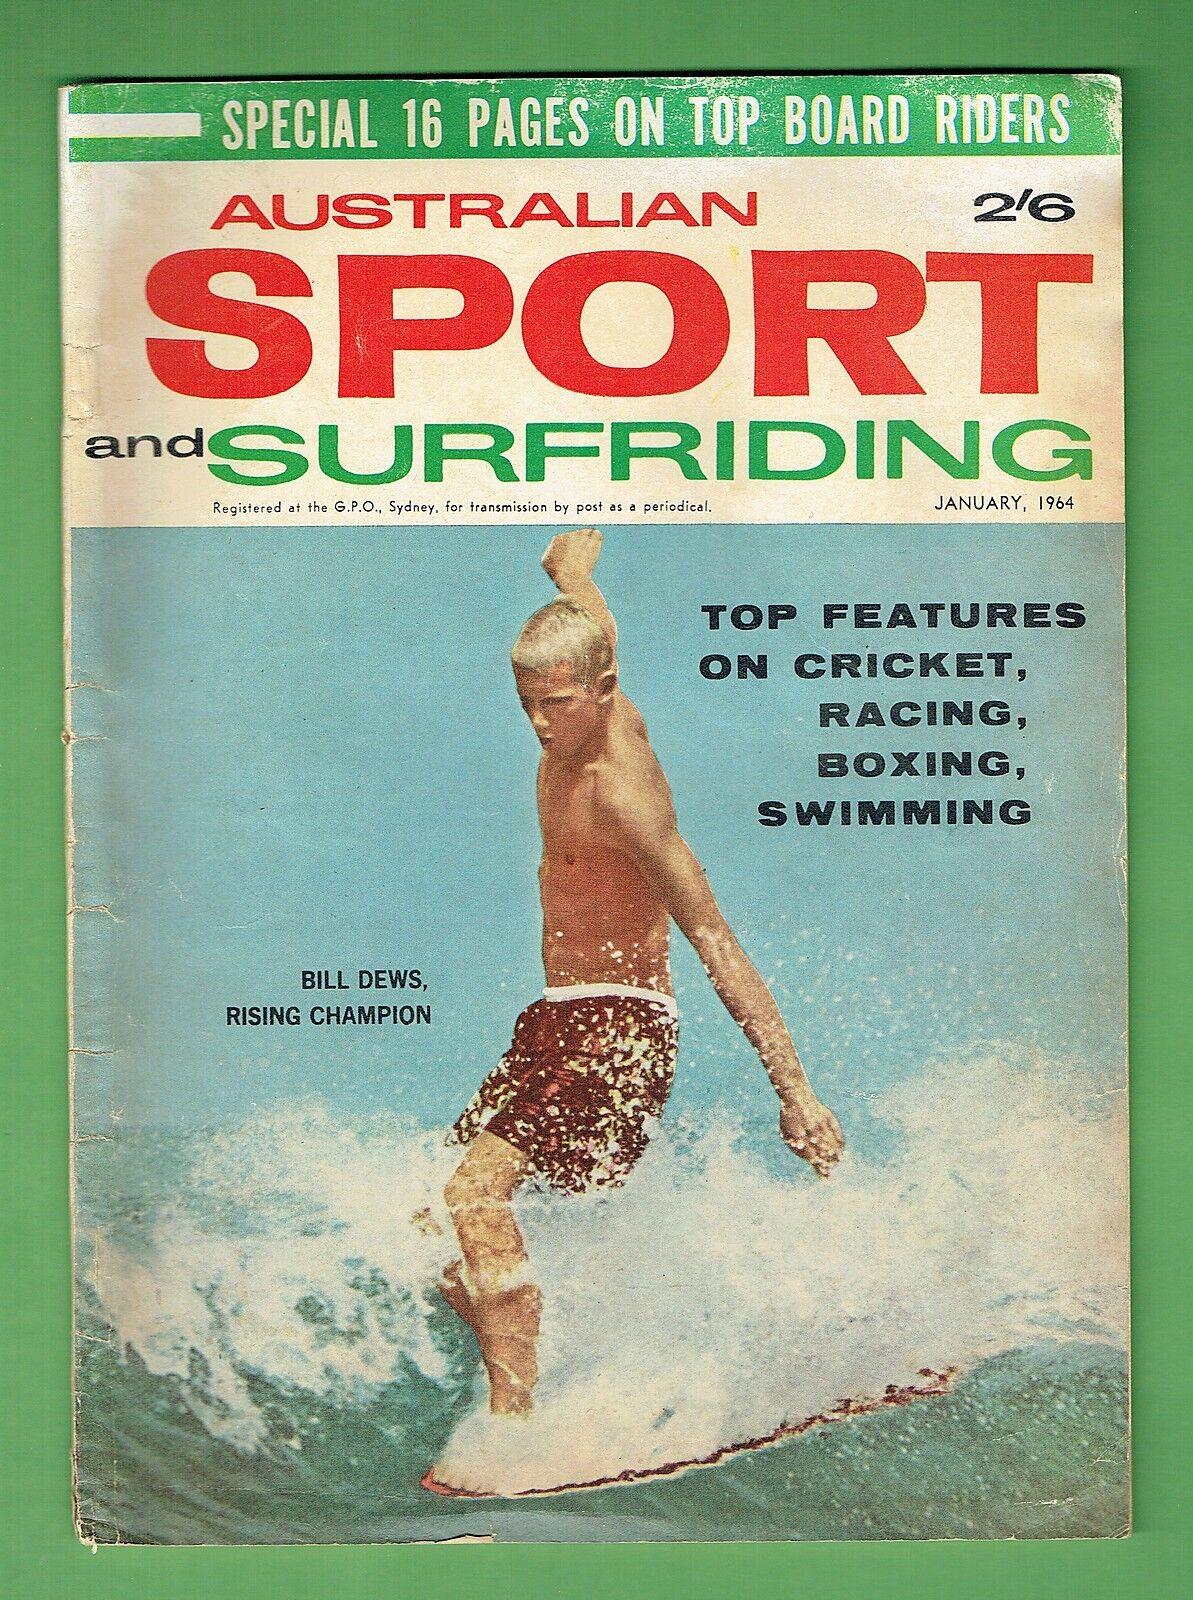 D172. AUSTRALIAN SPORT AND SURFRIDING MAGAZINE, JANUARY 1964